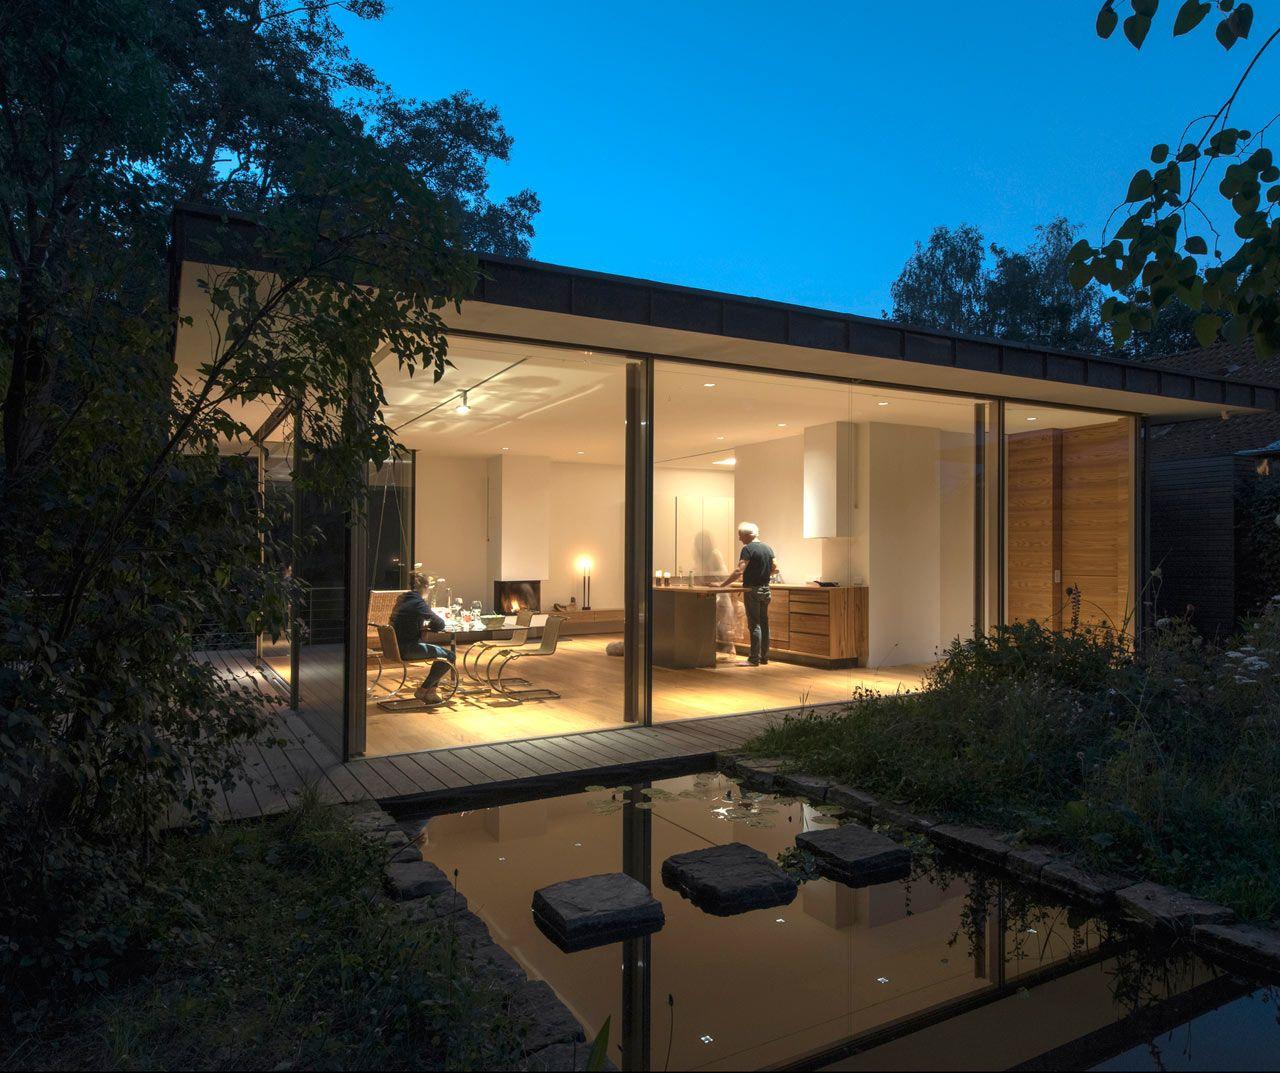 Award Winning House Plans Designs: Stunning Architecture A' Design Award Winners 2017